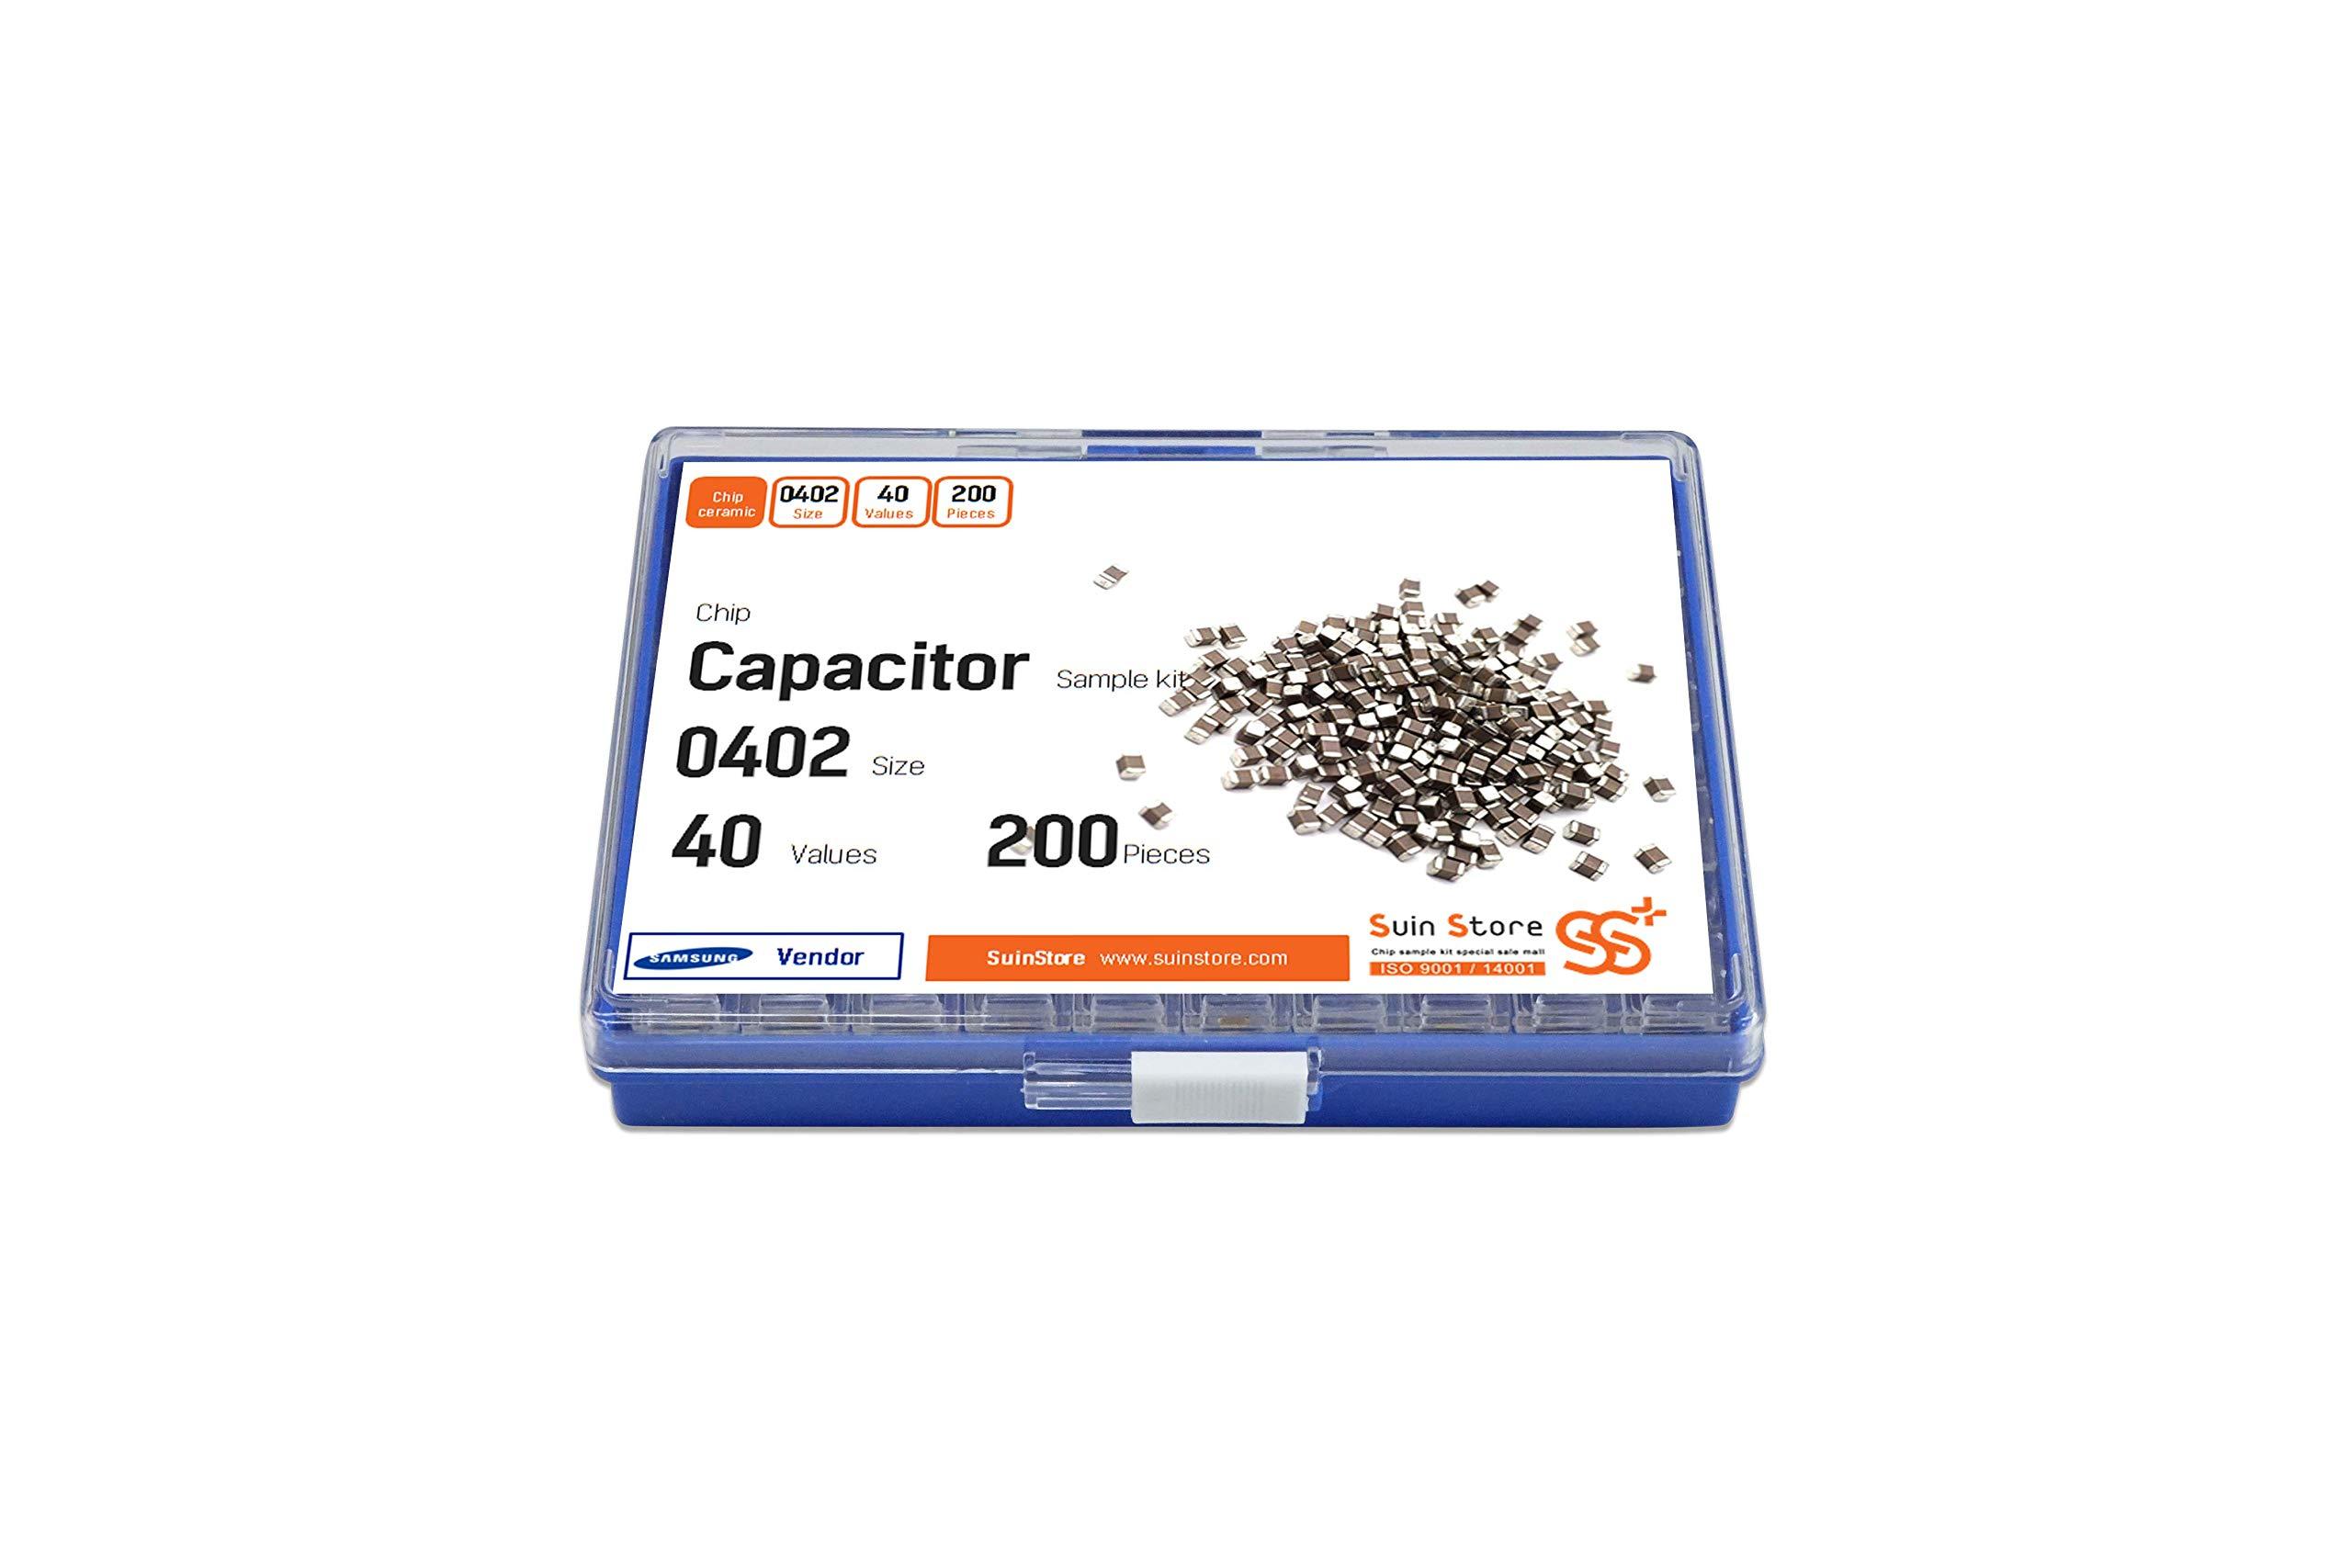 SMD Chip Capacitor Assortment Kit 0402, 0.75pF ~ 4.7uF, 40 Values, 200pcs per Value